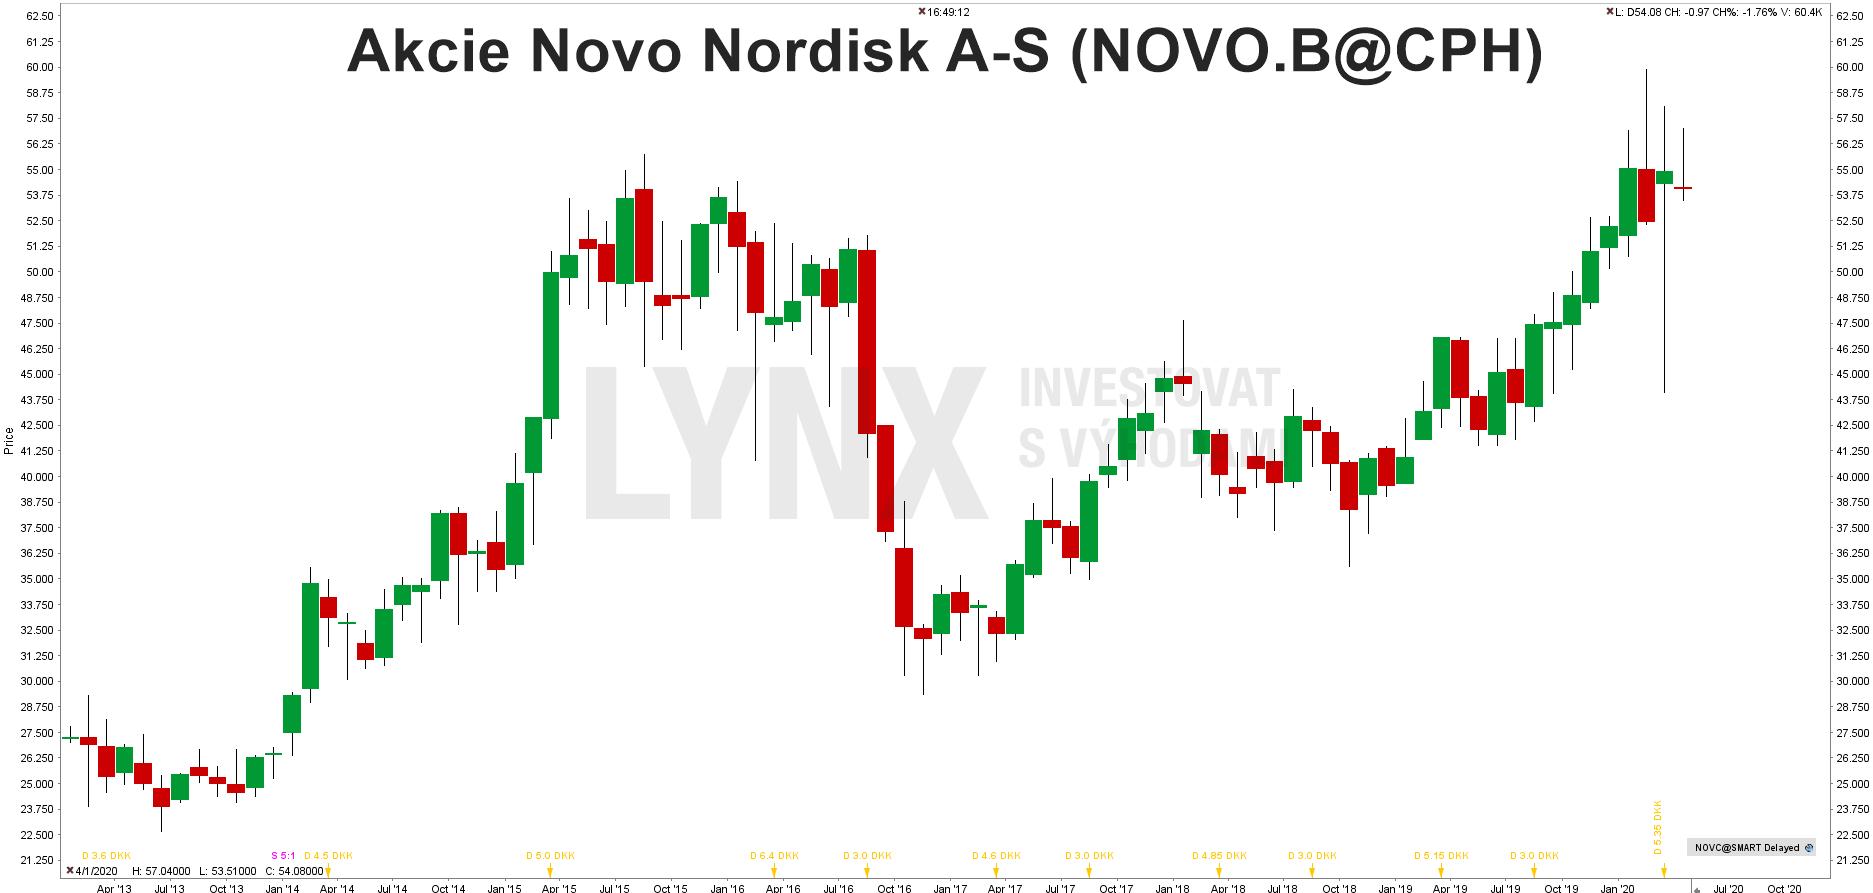 Graf akcie Novo Nordisk